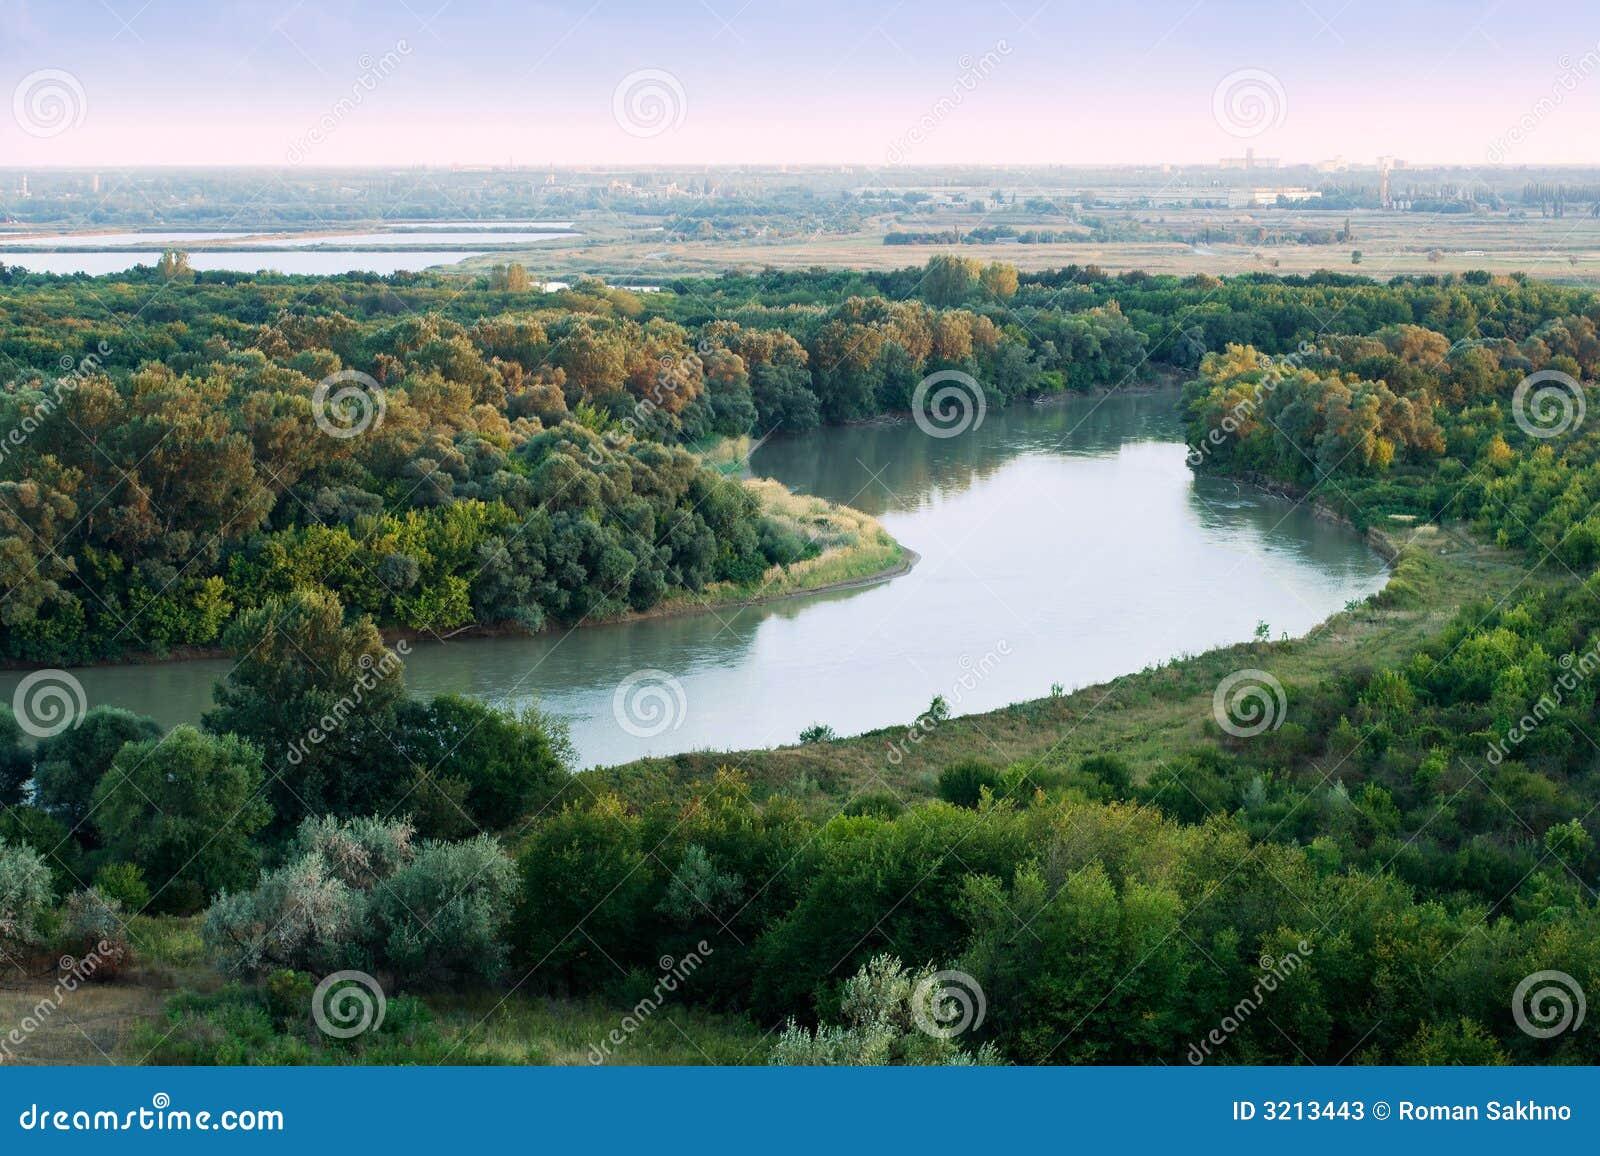 Kuban river picture: kuban river 3213443